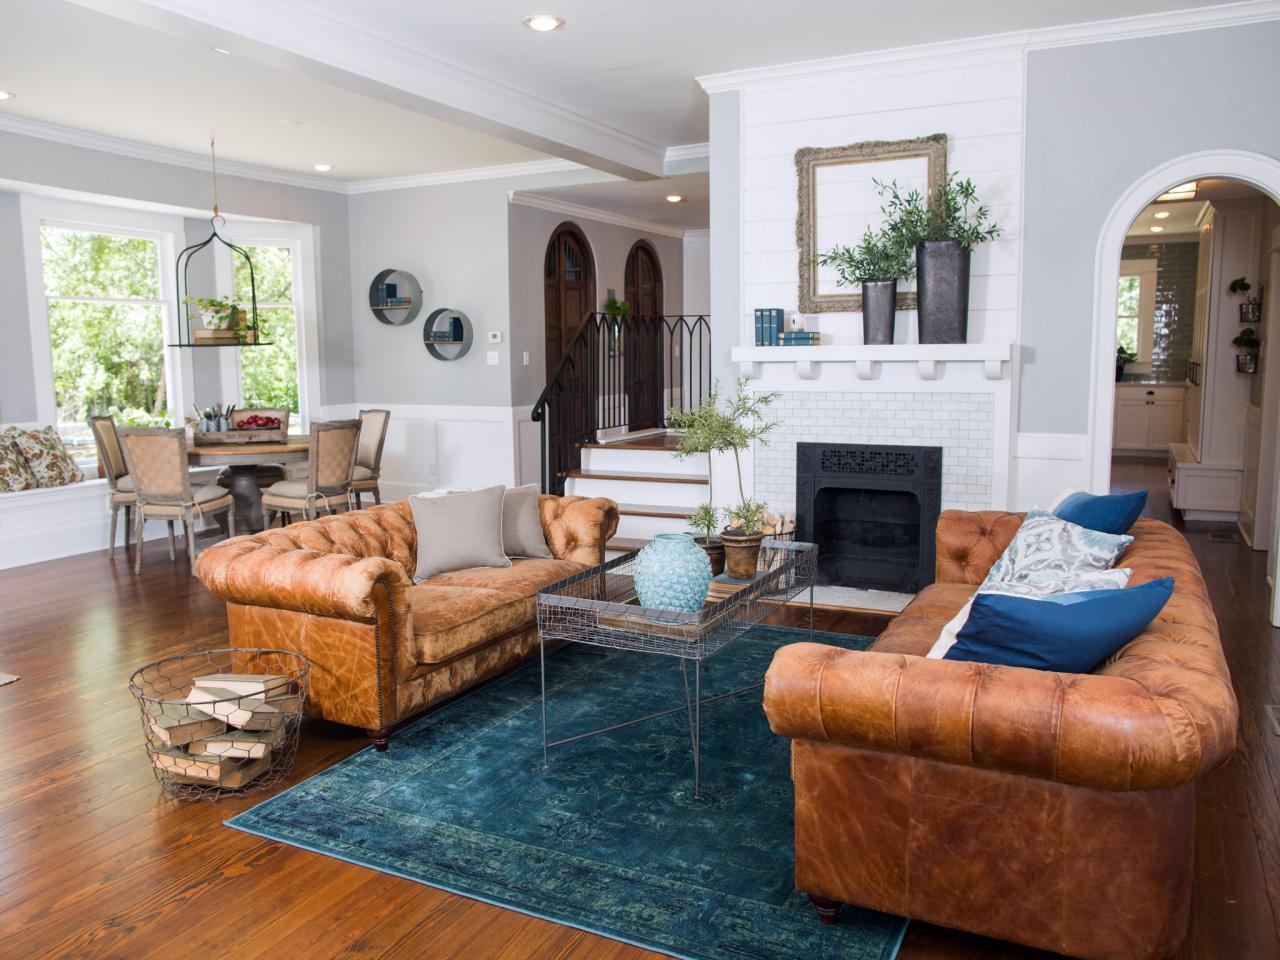 A living room on HGTV's 'Fixer Upper'